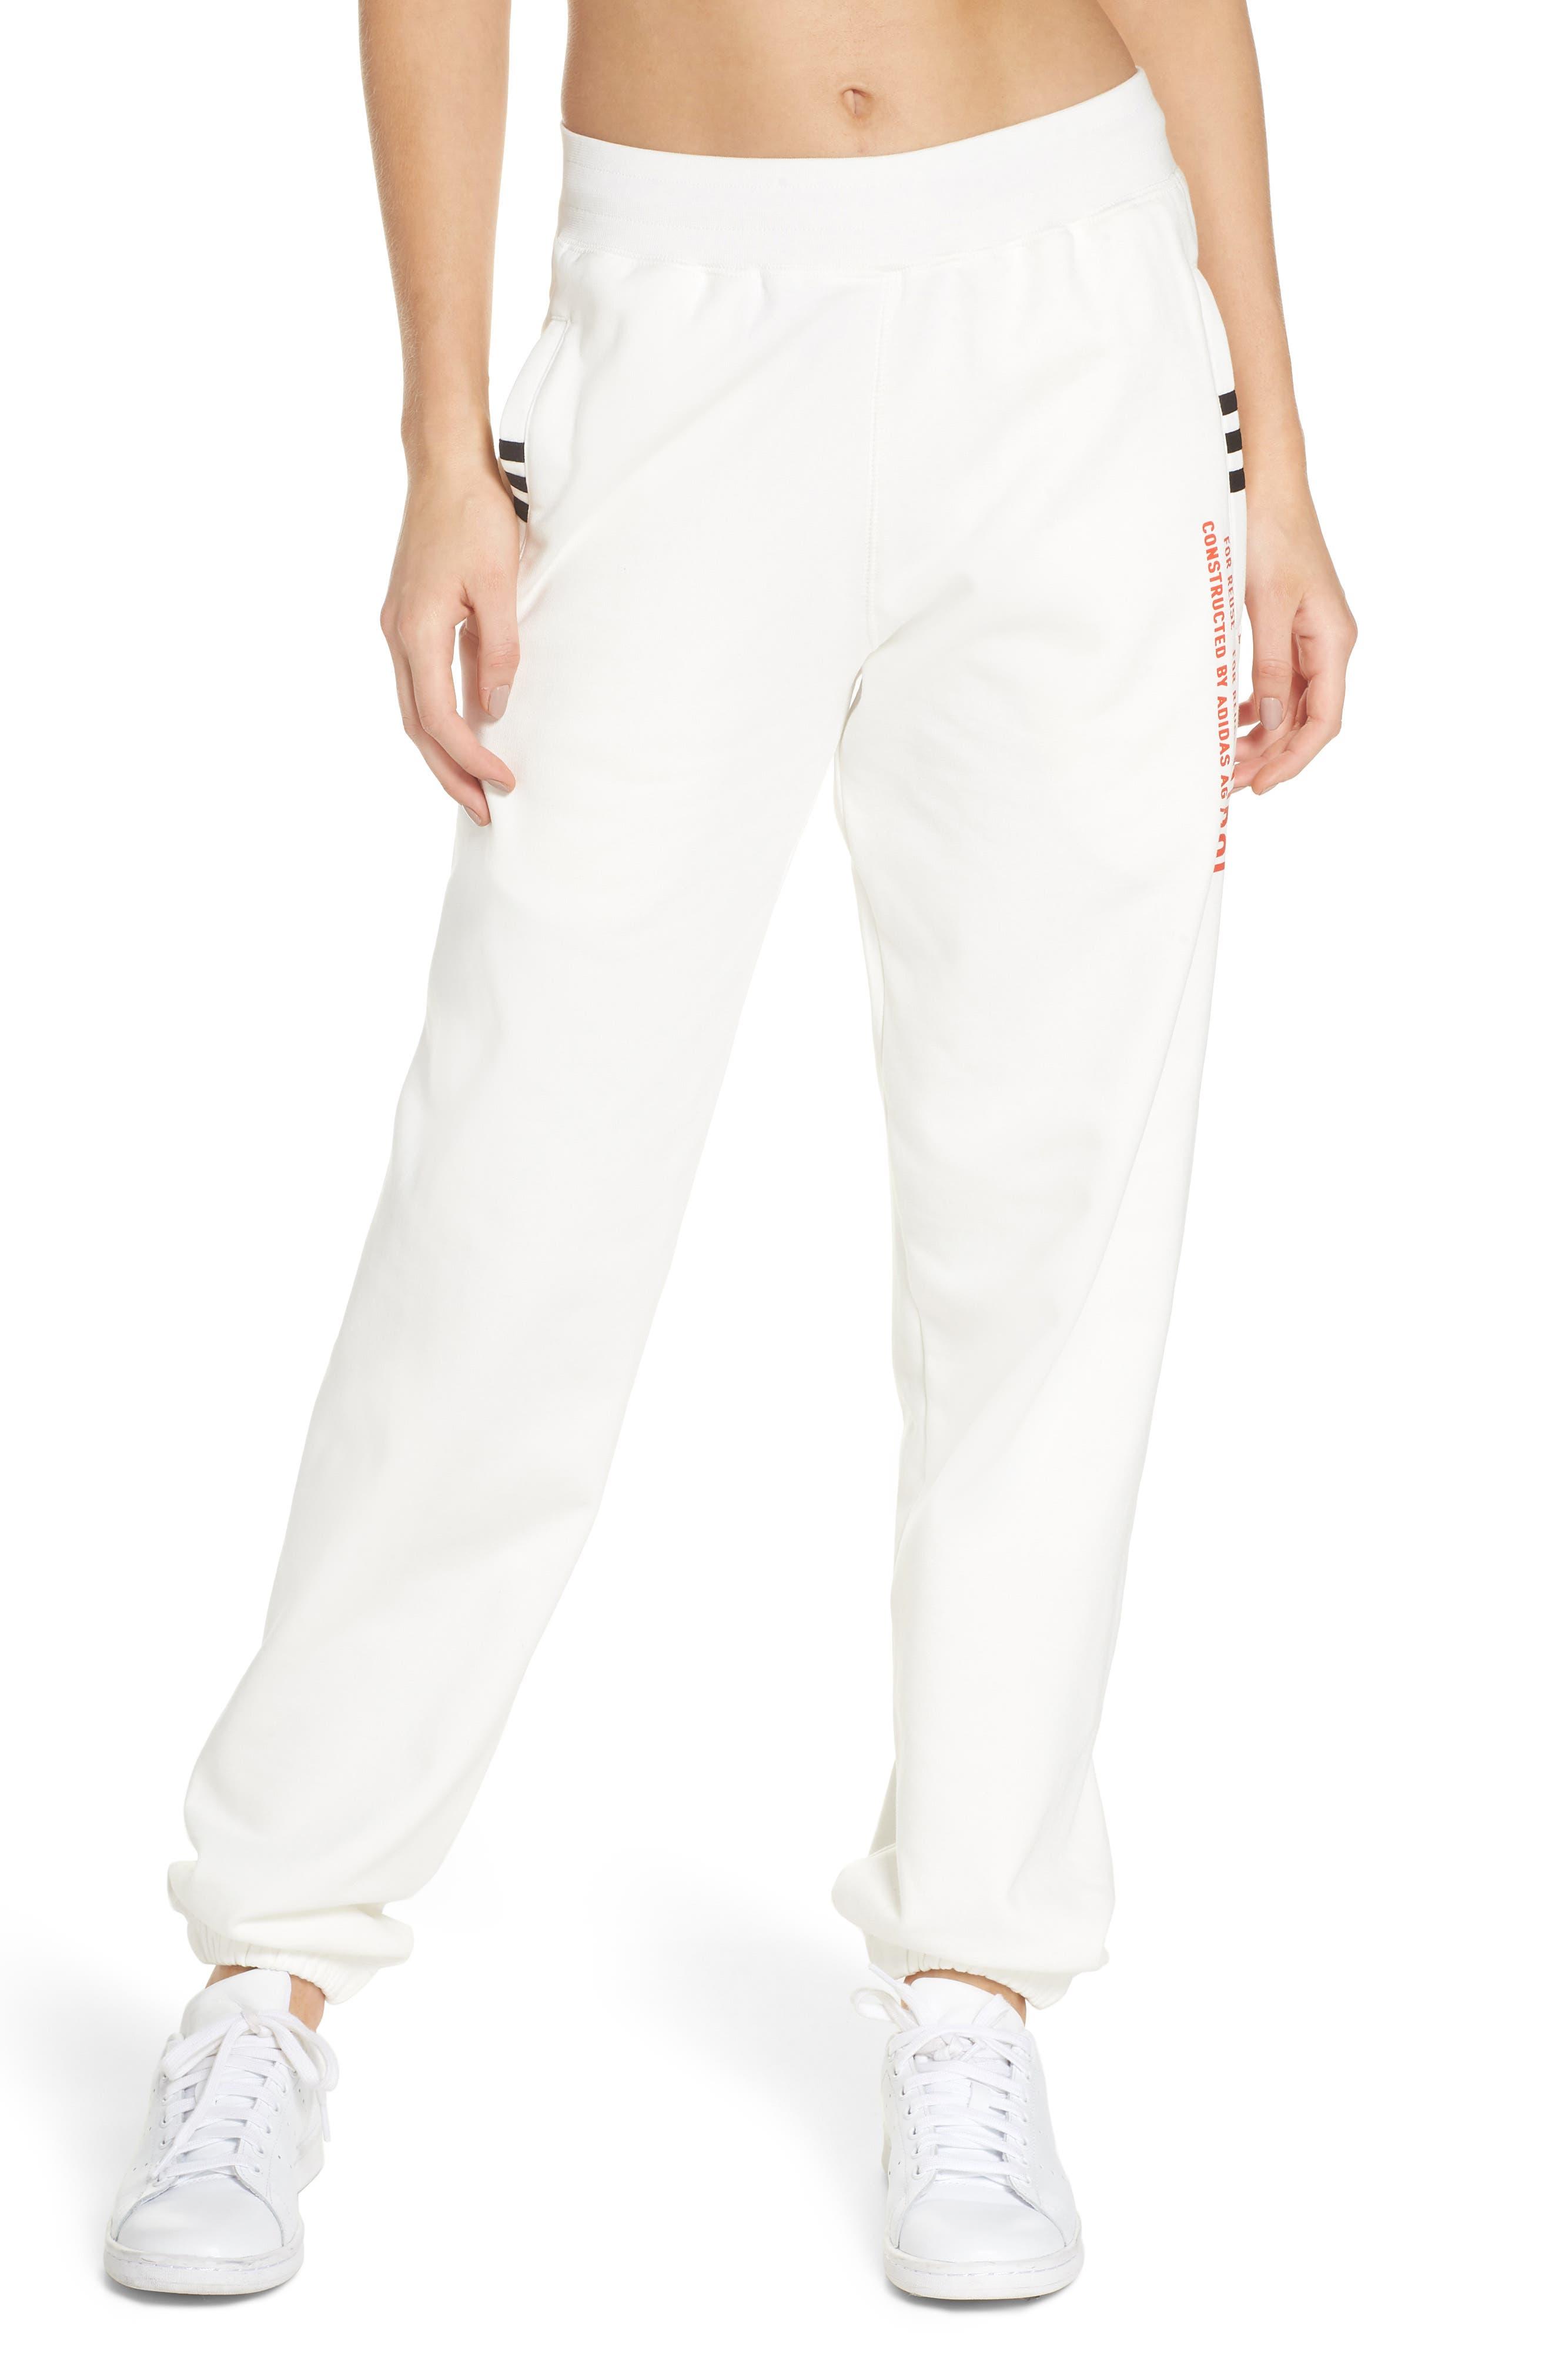 Graphite Jogger Pants,                         Main,                         color, White/ Orange/ Black